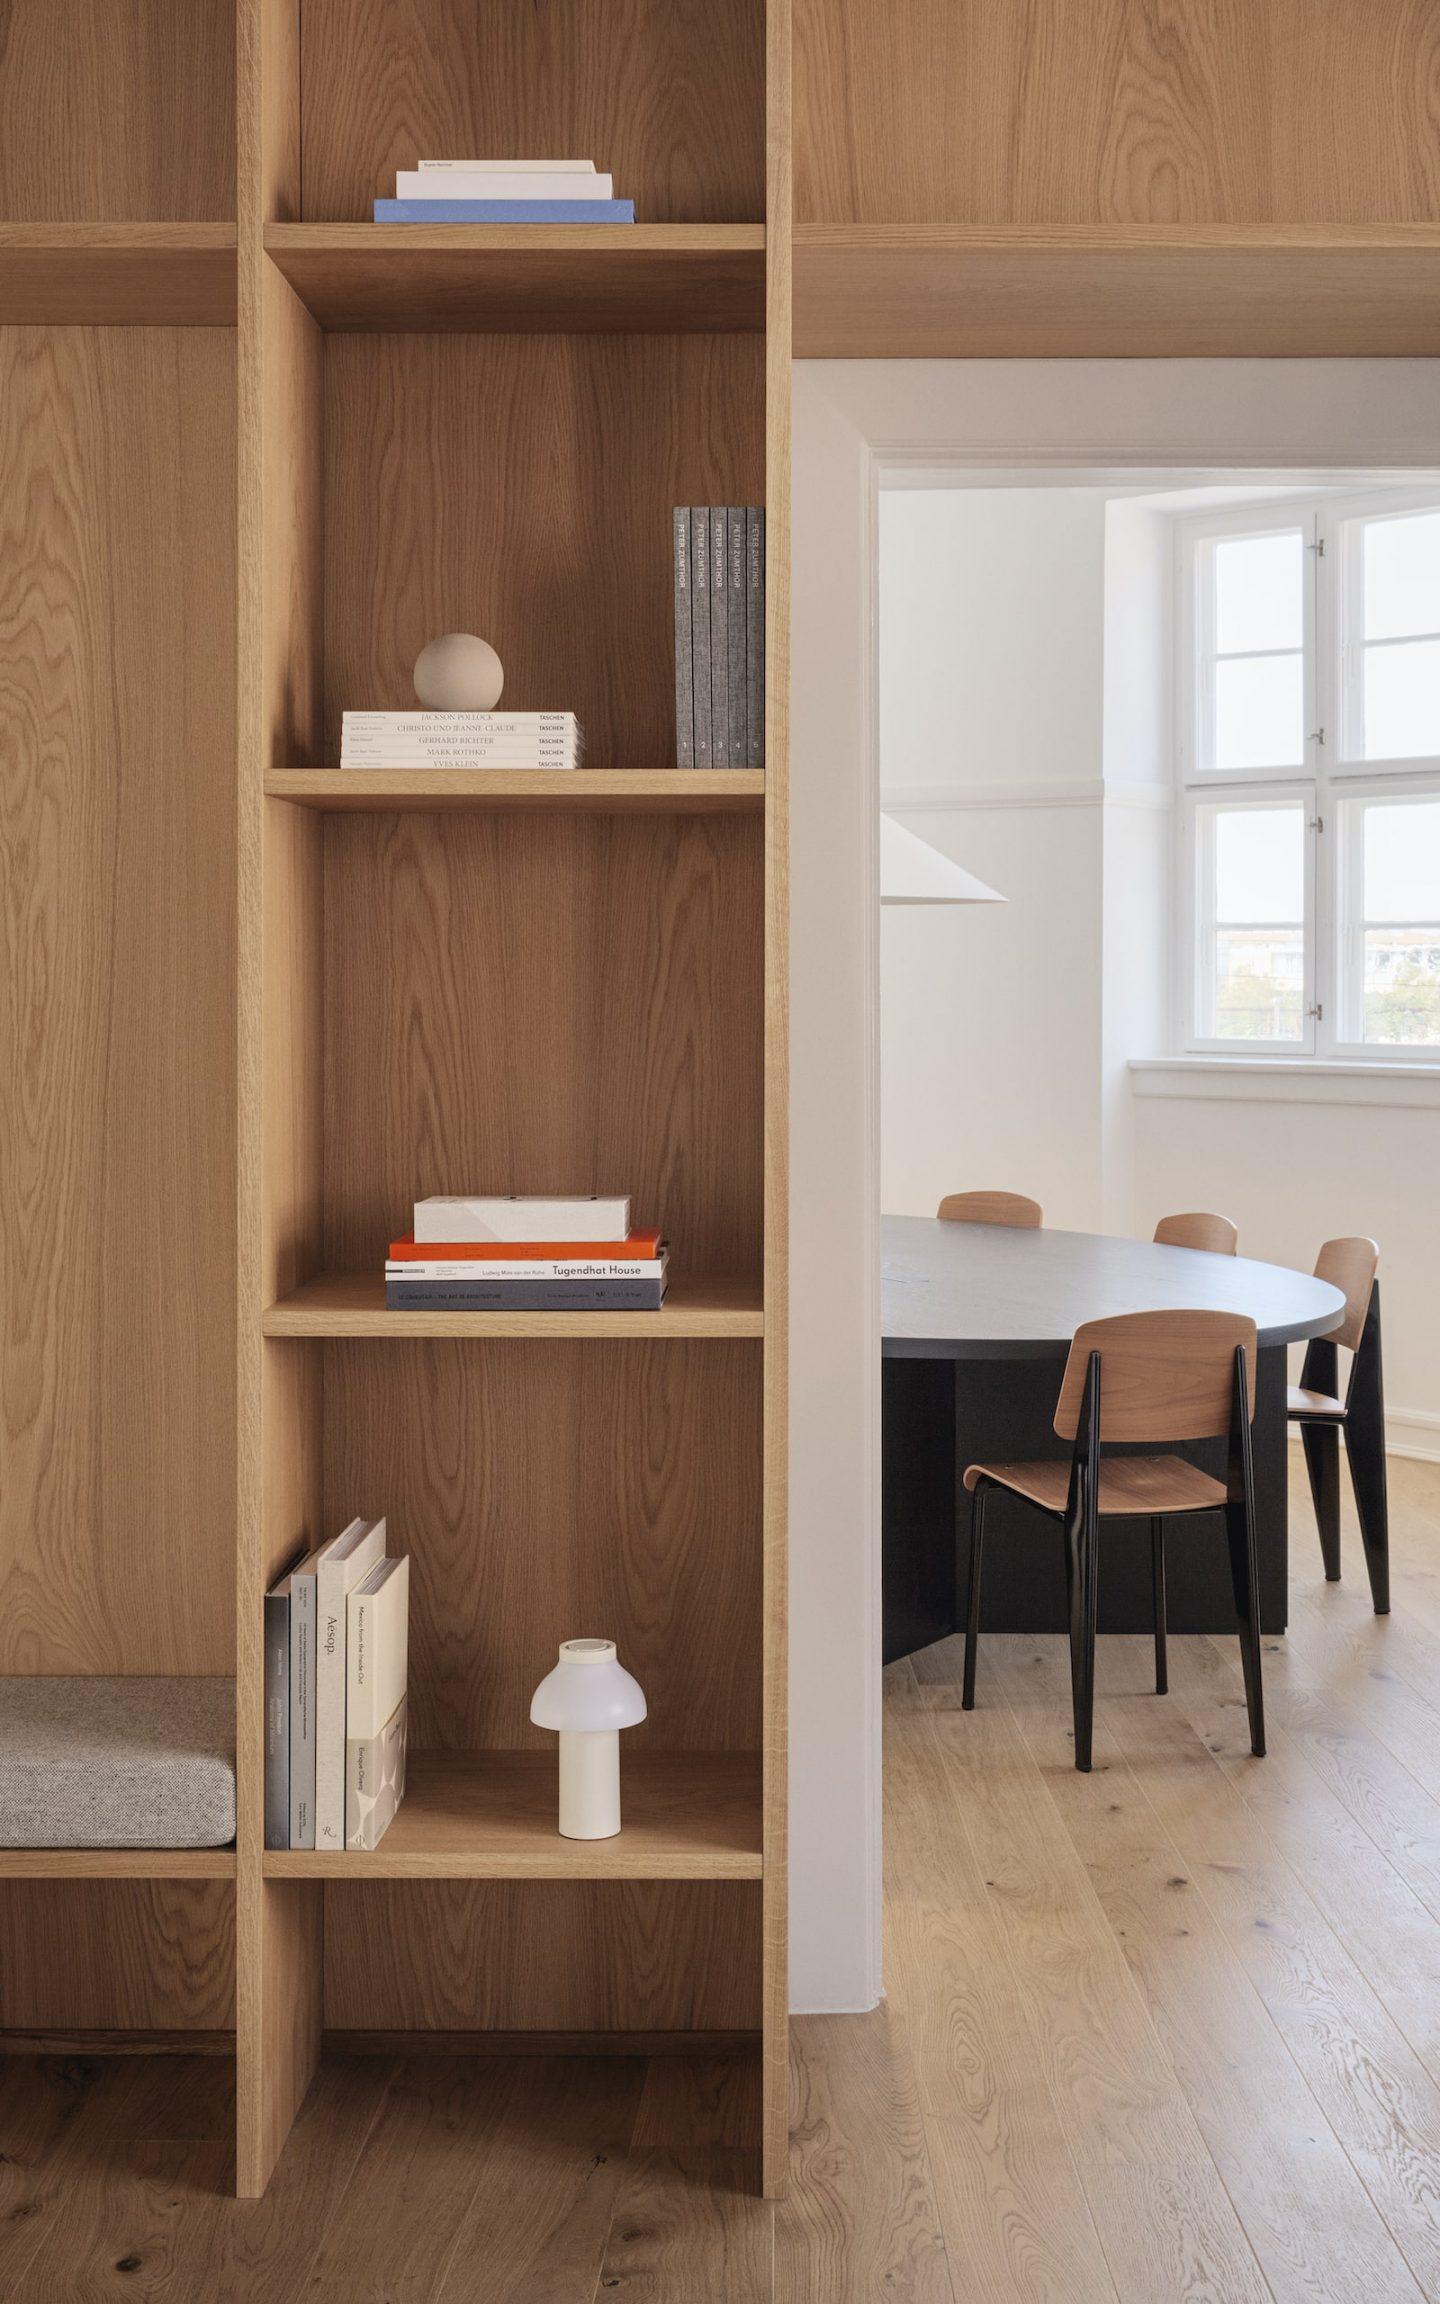 IGNANT-Design-Aspekt-Office-022